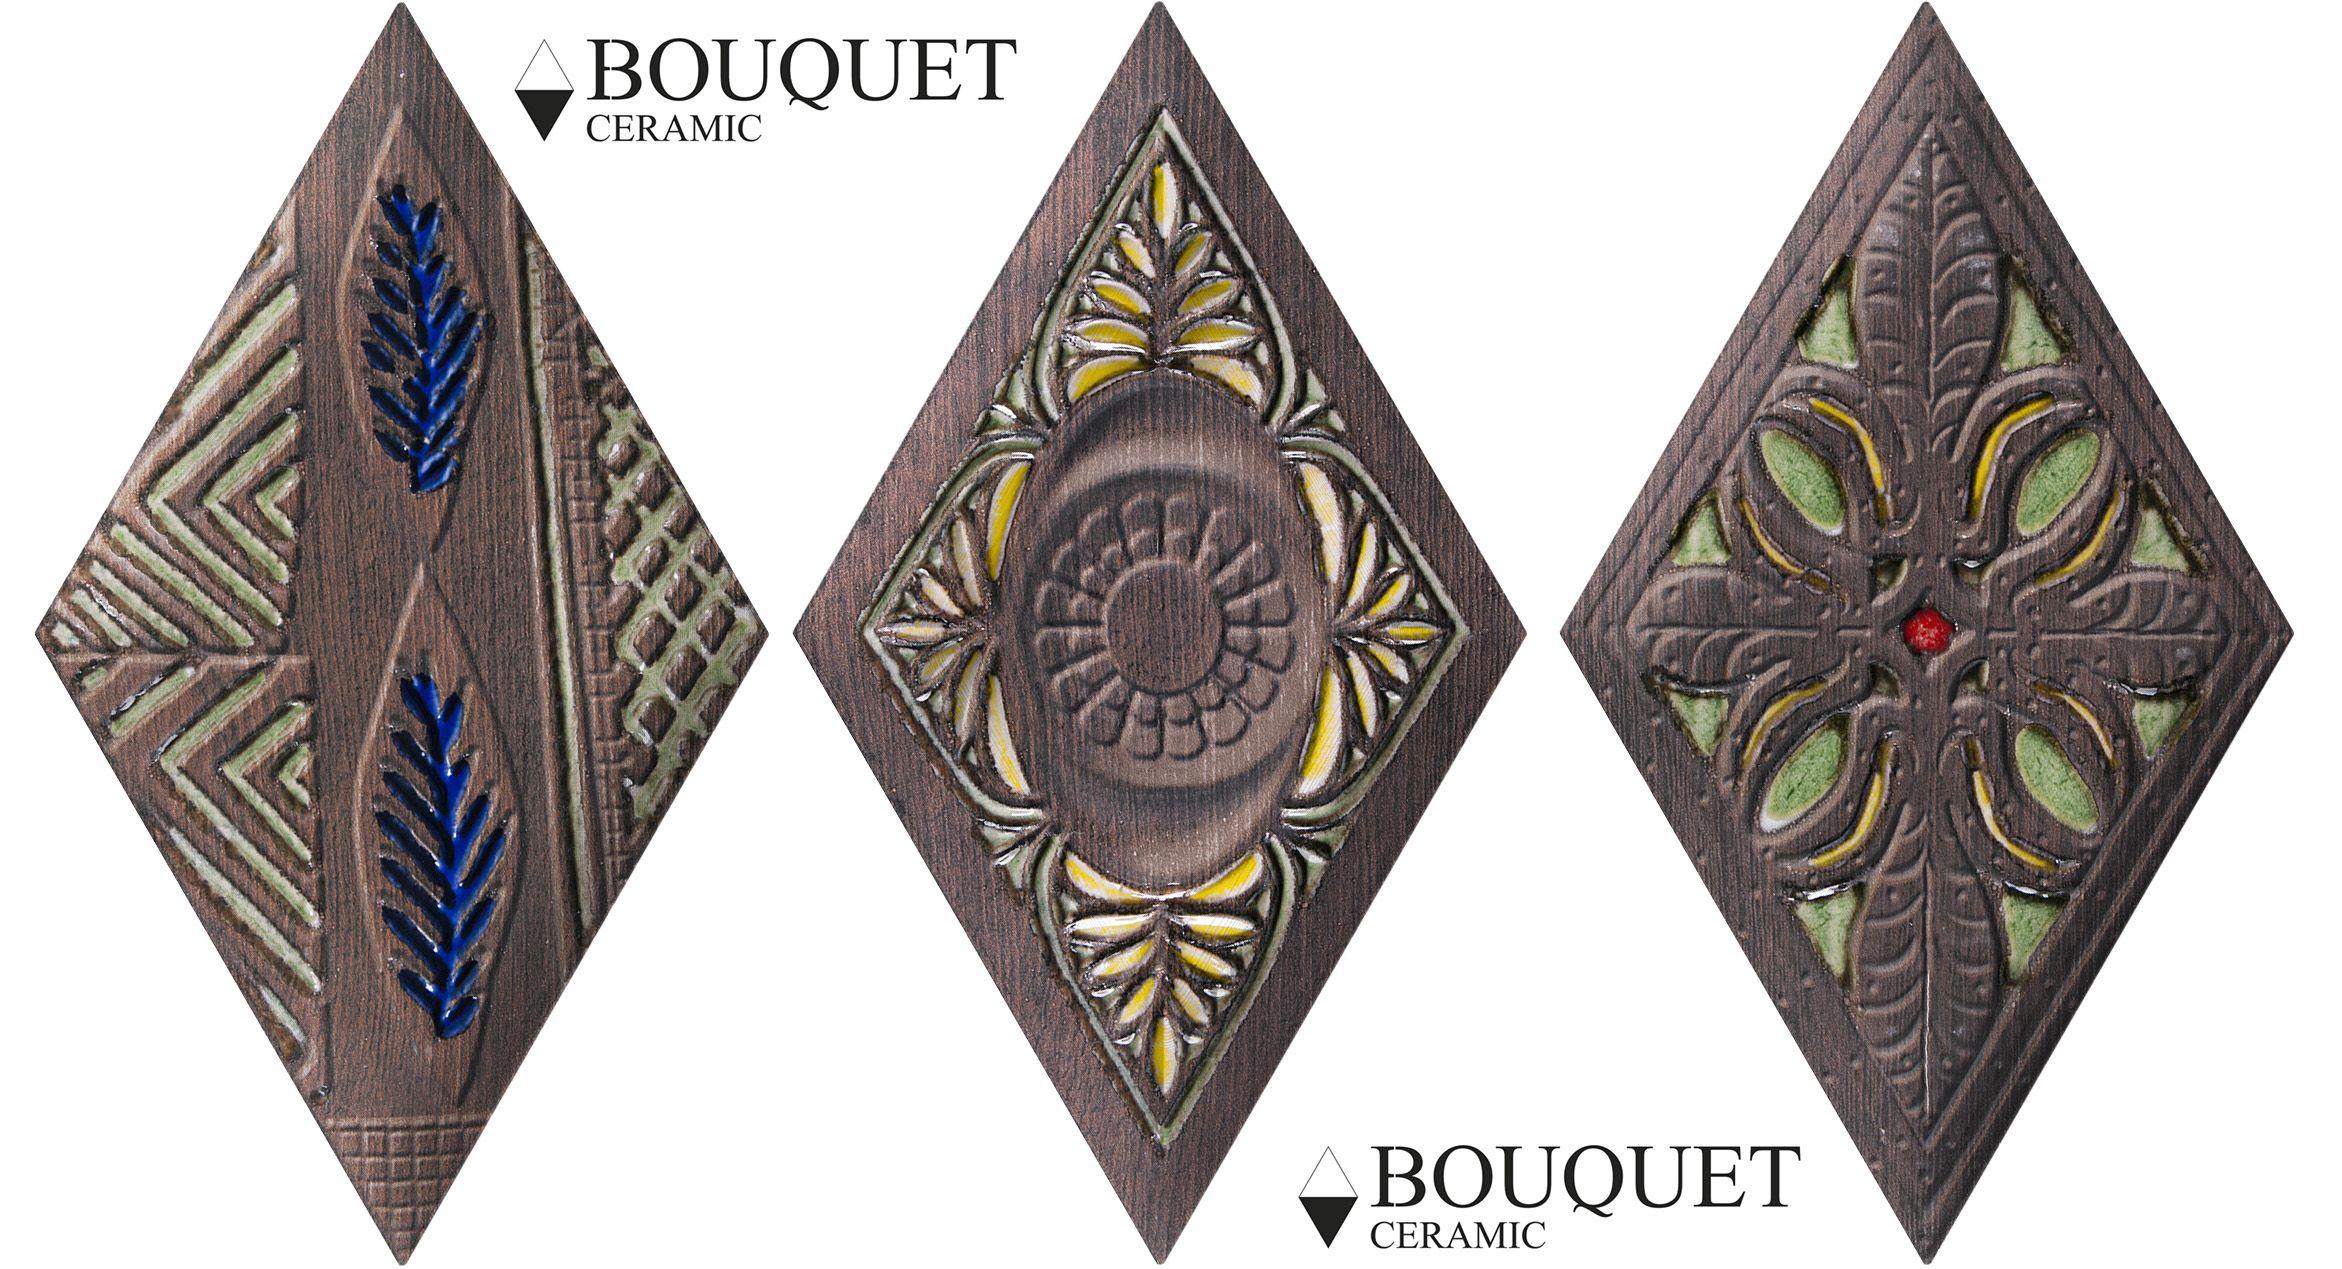 Ceramic Relieff Wood Relieve Ceramico Con Acabado Madera Azulejos Madera De Madera